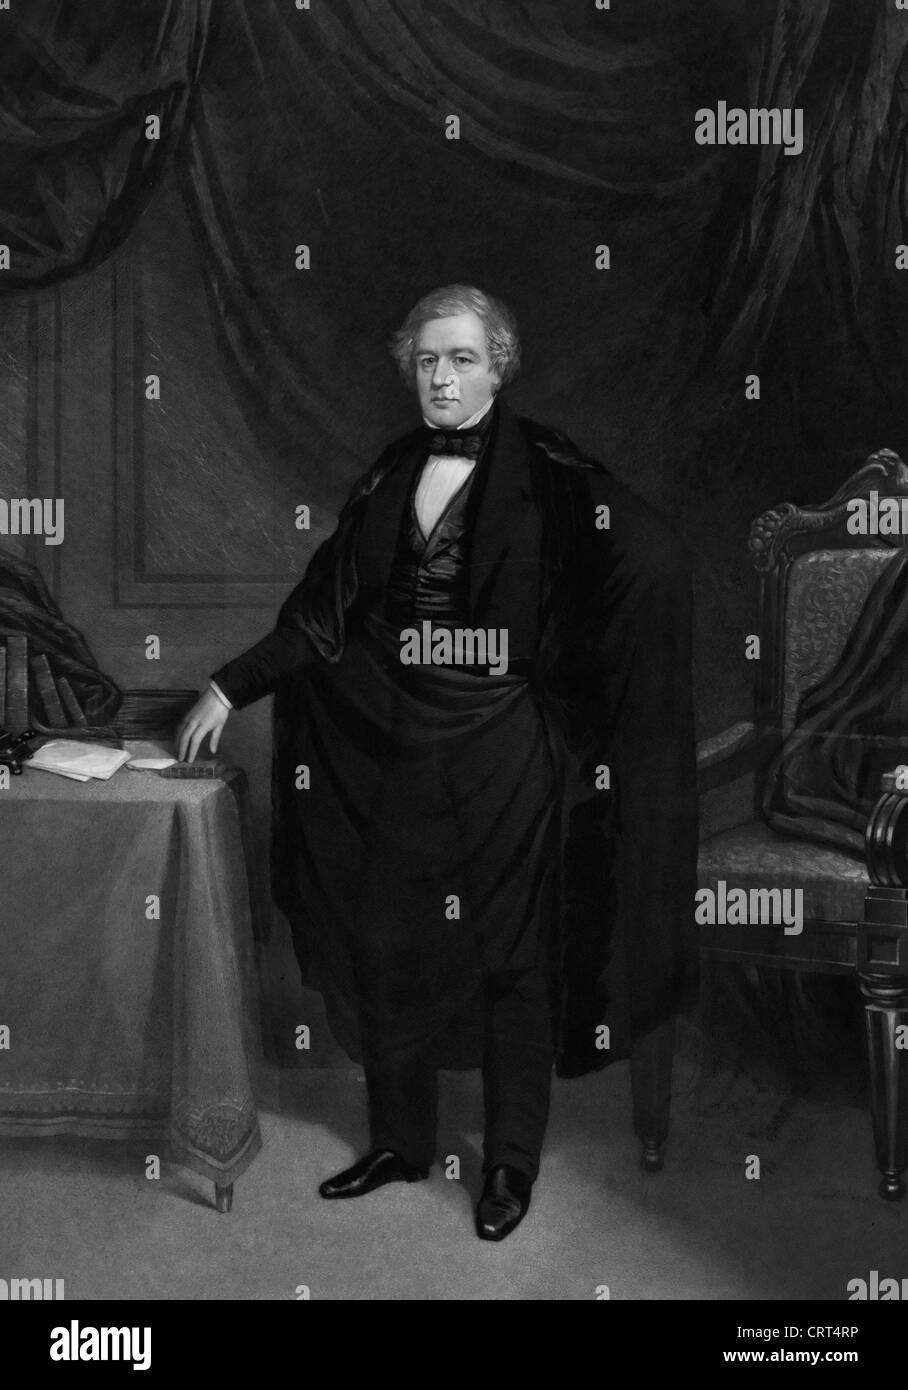 Millard Fillmore, 13th President to the United States America, 1850 - 1853 Stock Photo